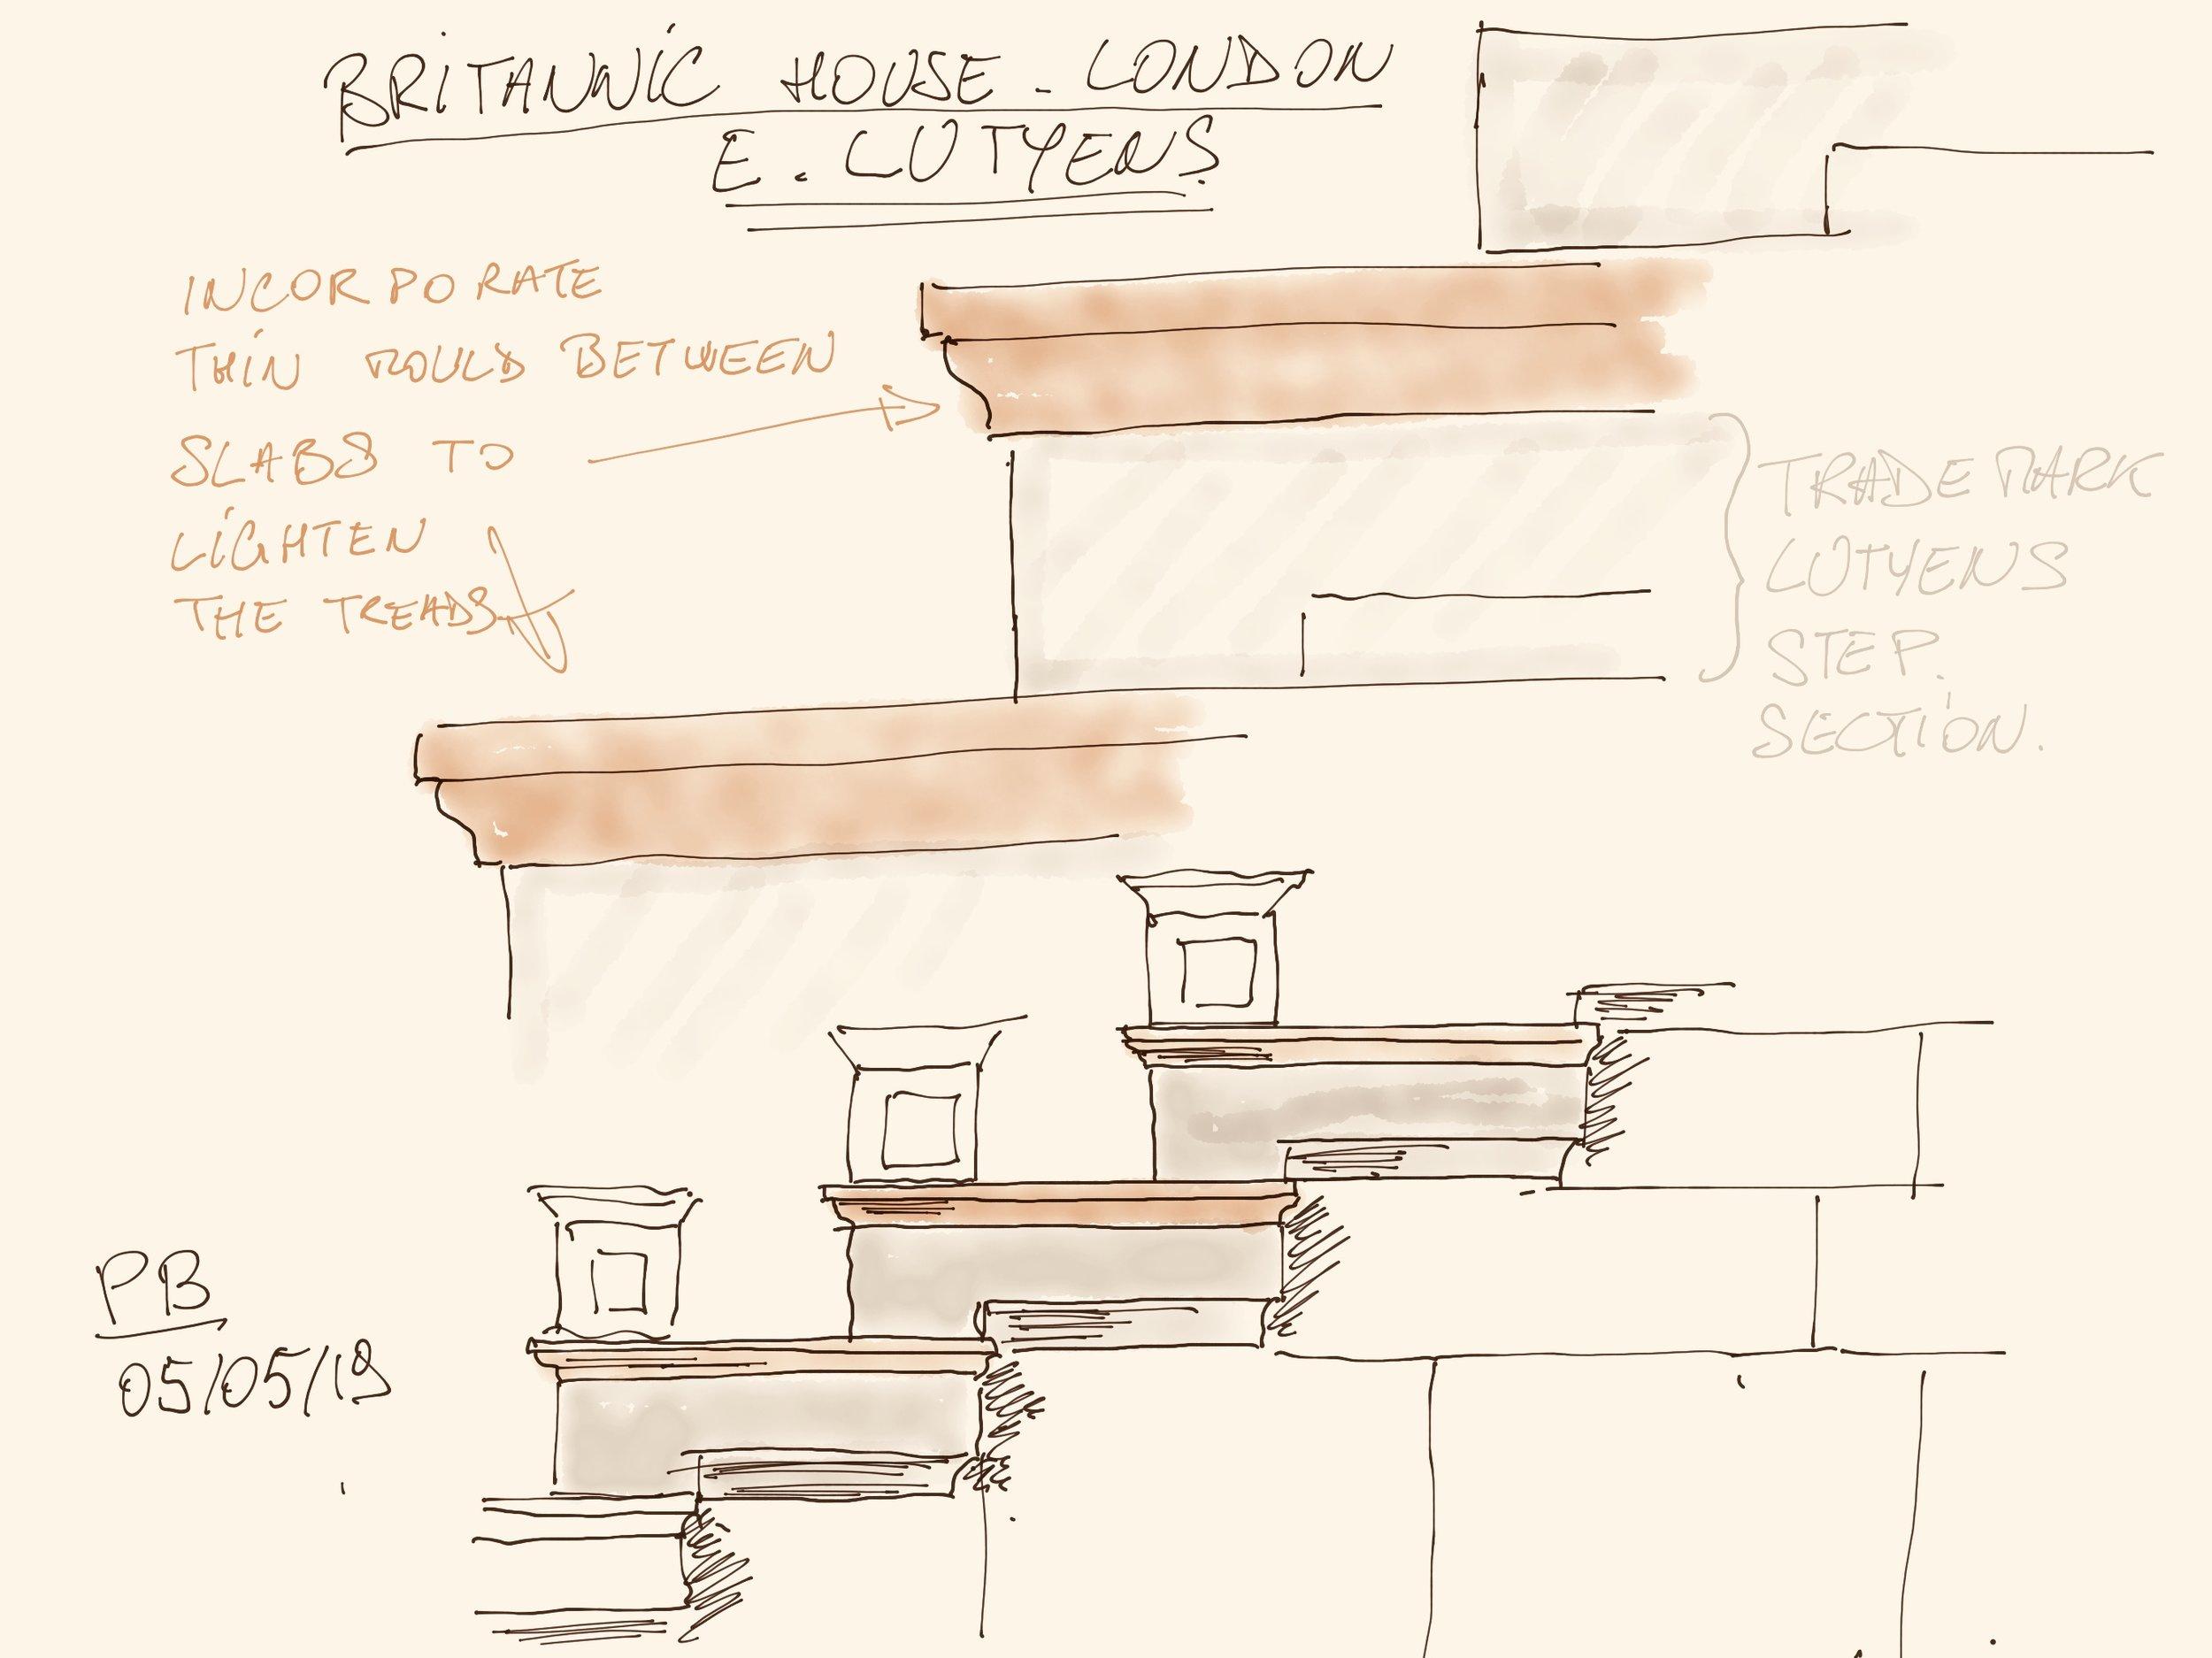 2) Britannic House.jpg